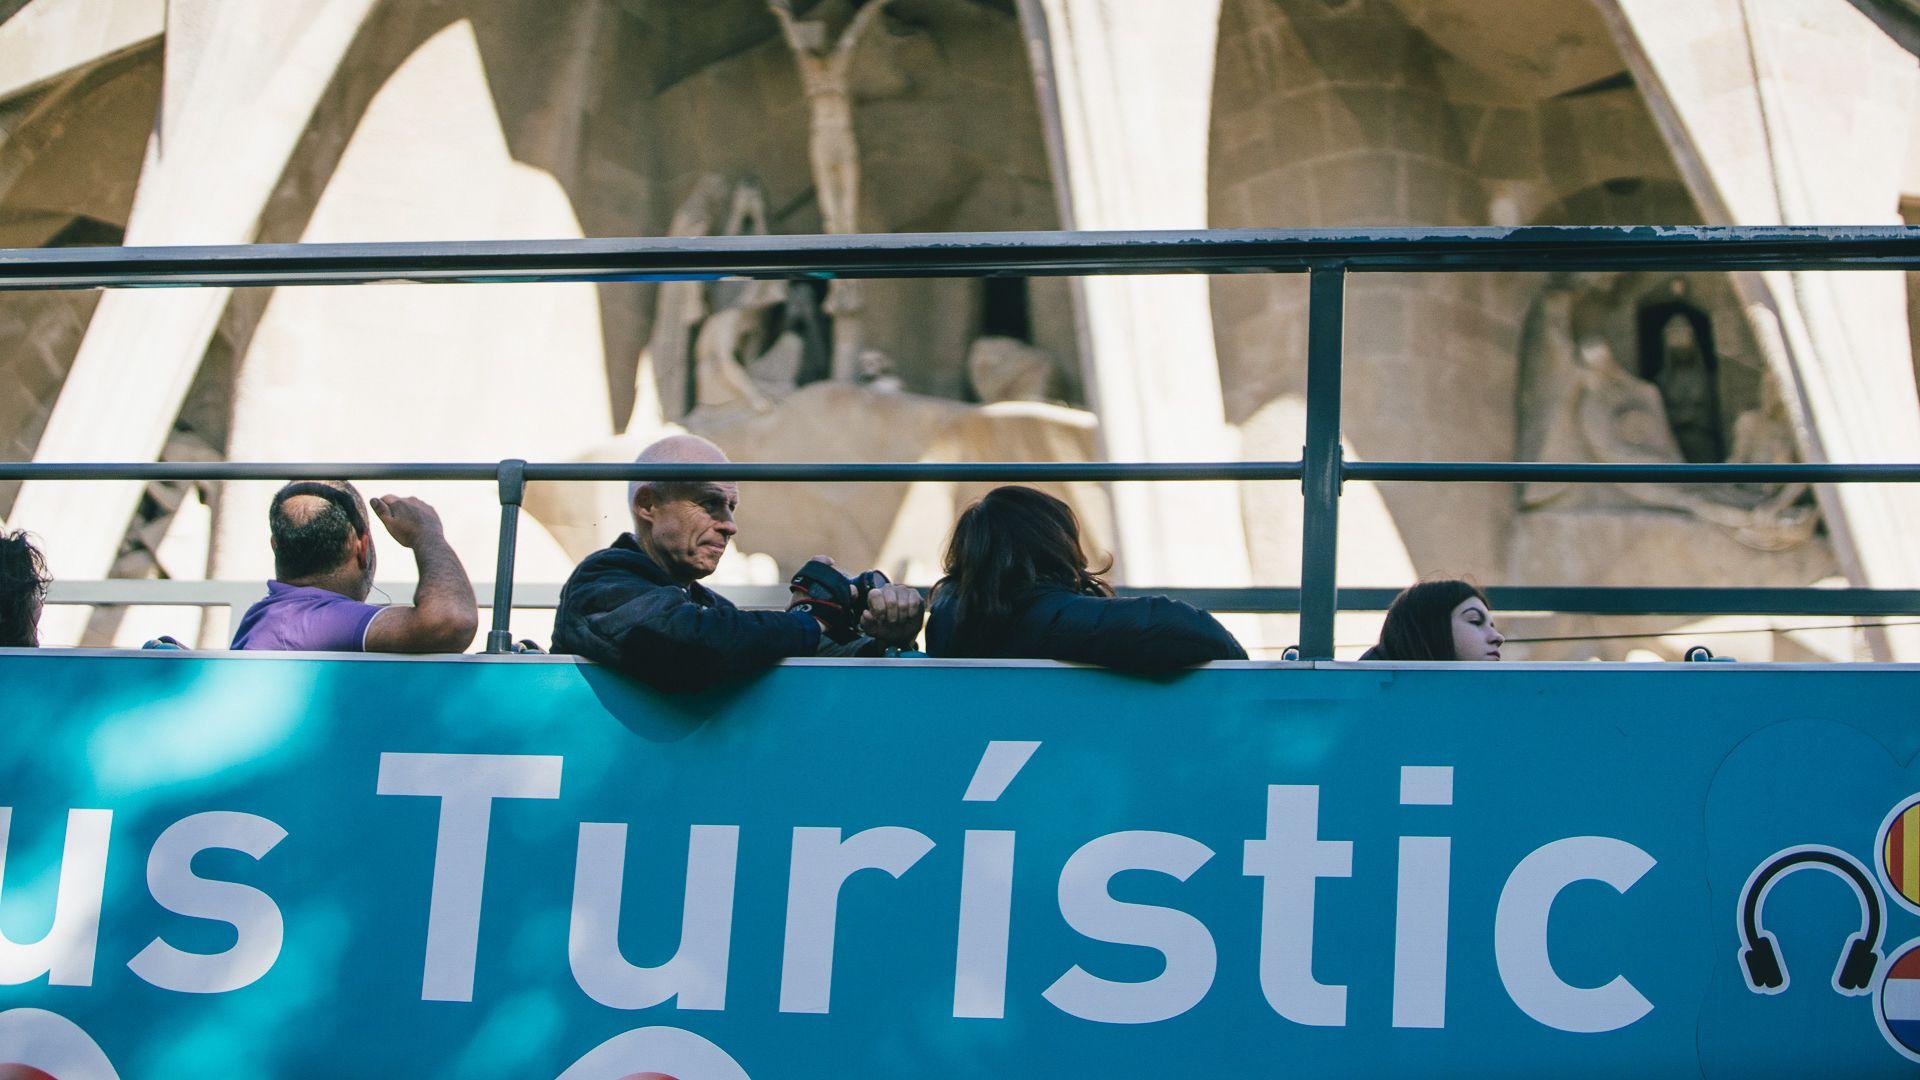 bus turístic barcelona sagrada família